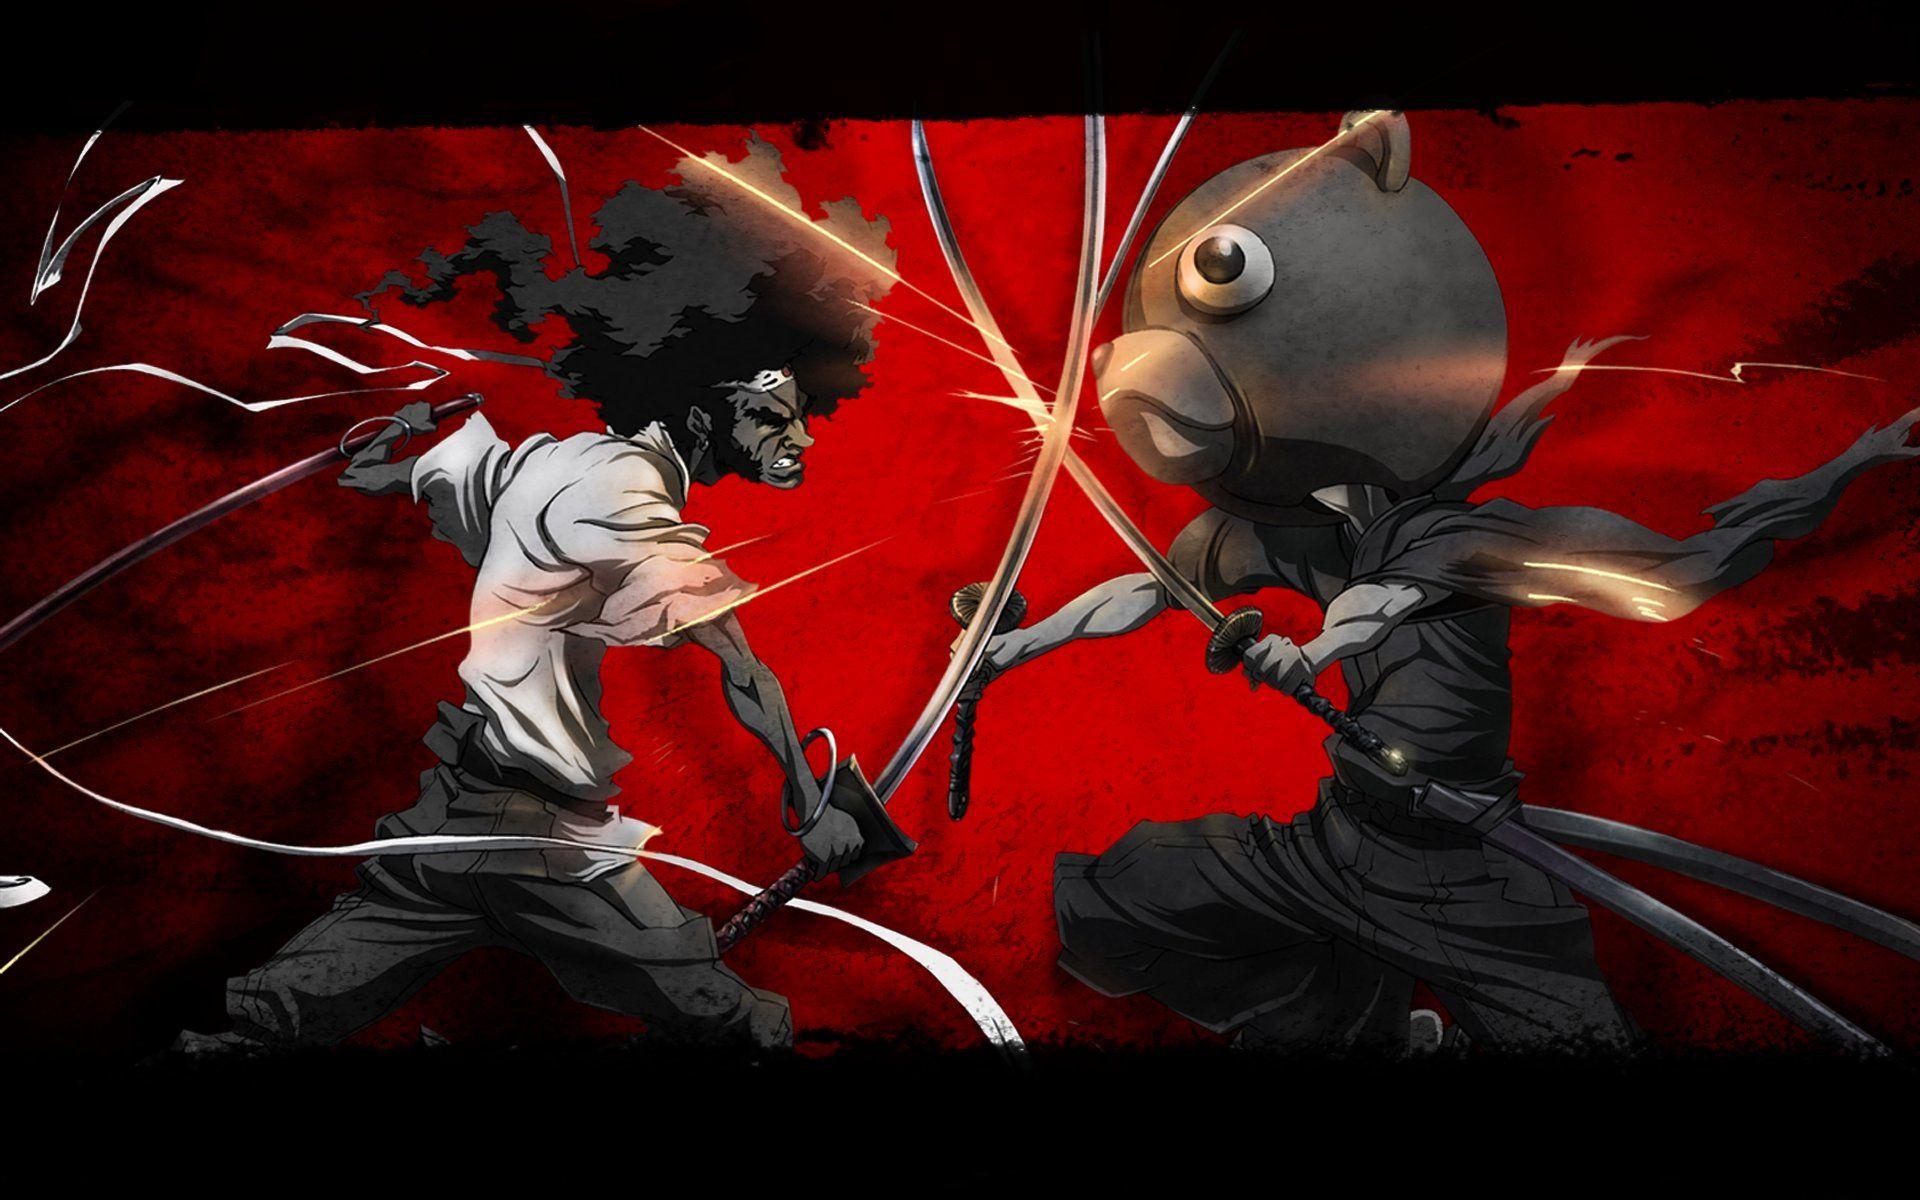 Pin By Vincent On Animate In 2019 Afro Samurai Samurai